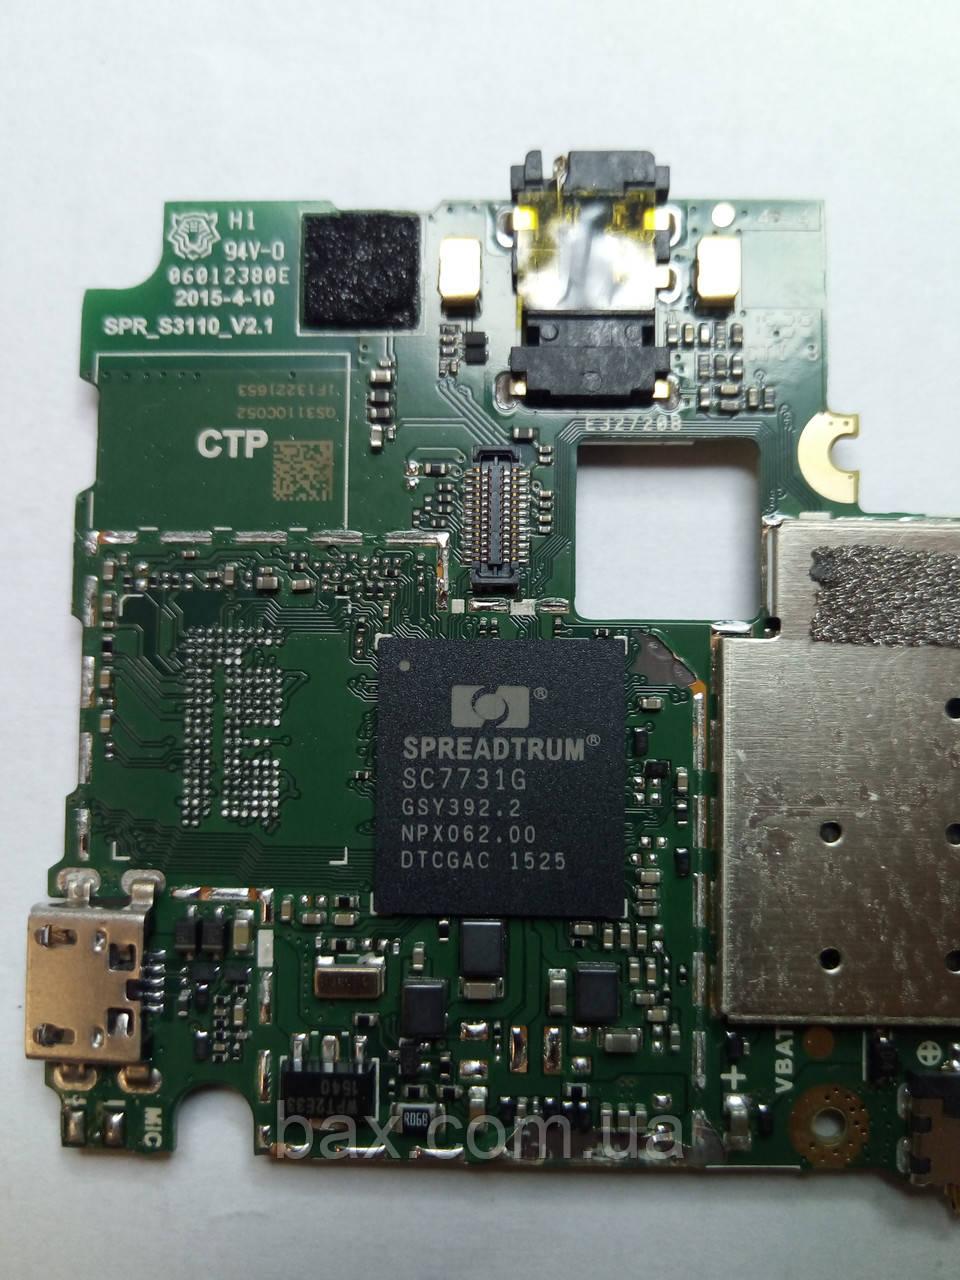 Микросхема процессора Spreadtrum SC7731G На плате Описание